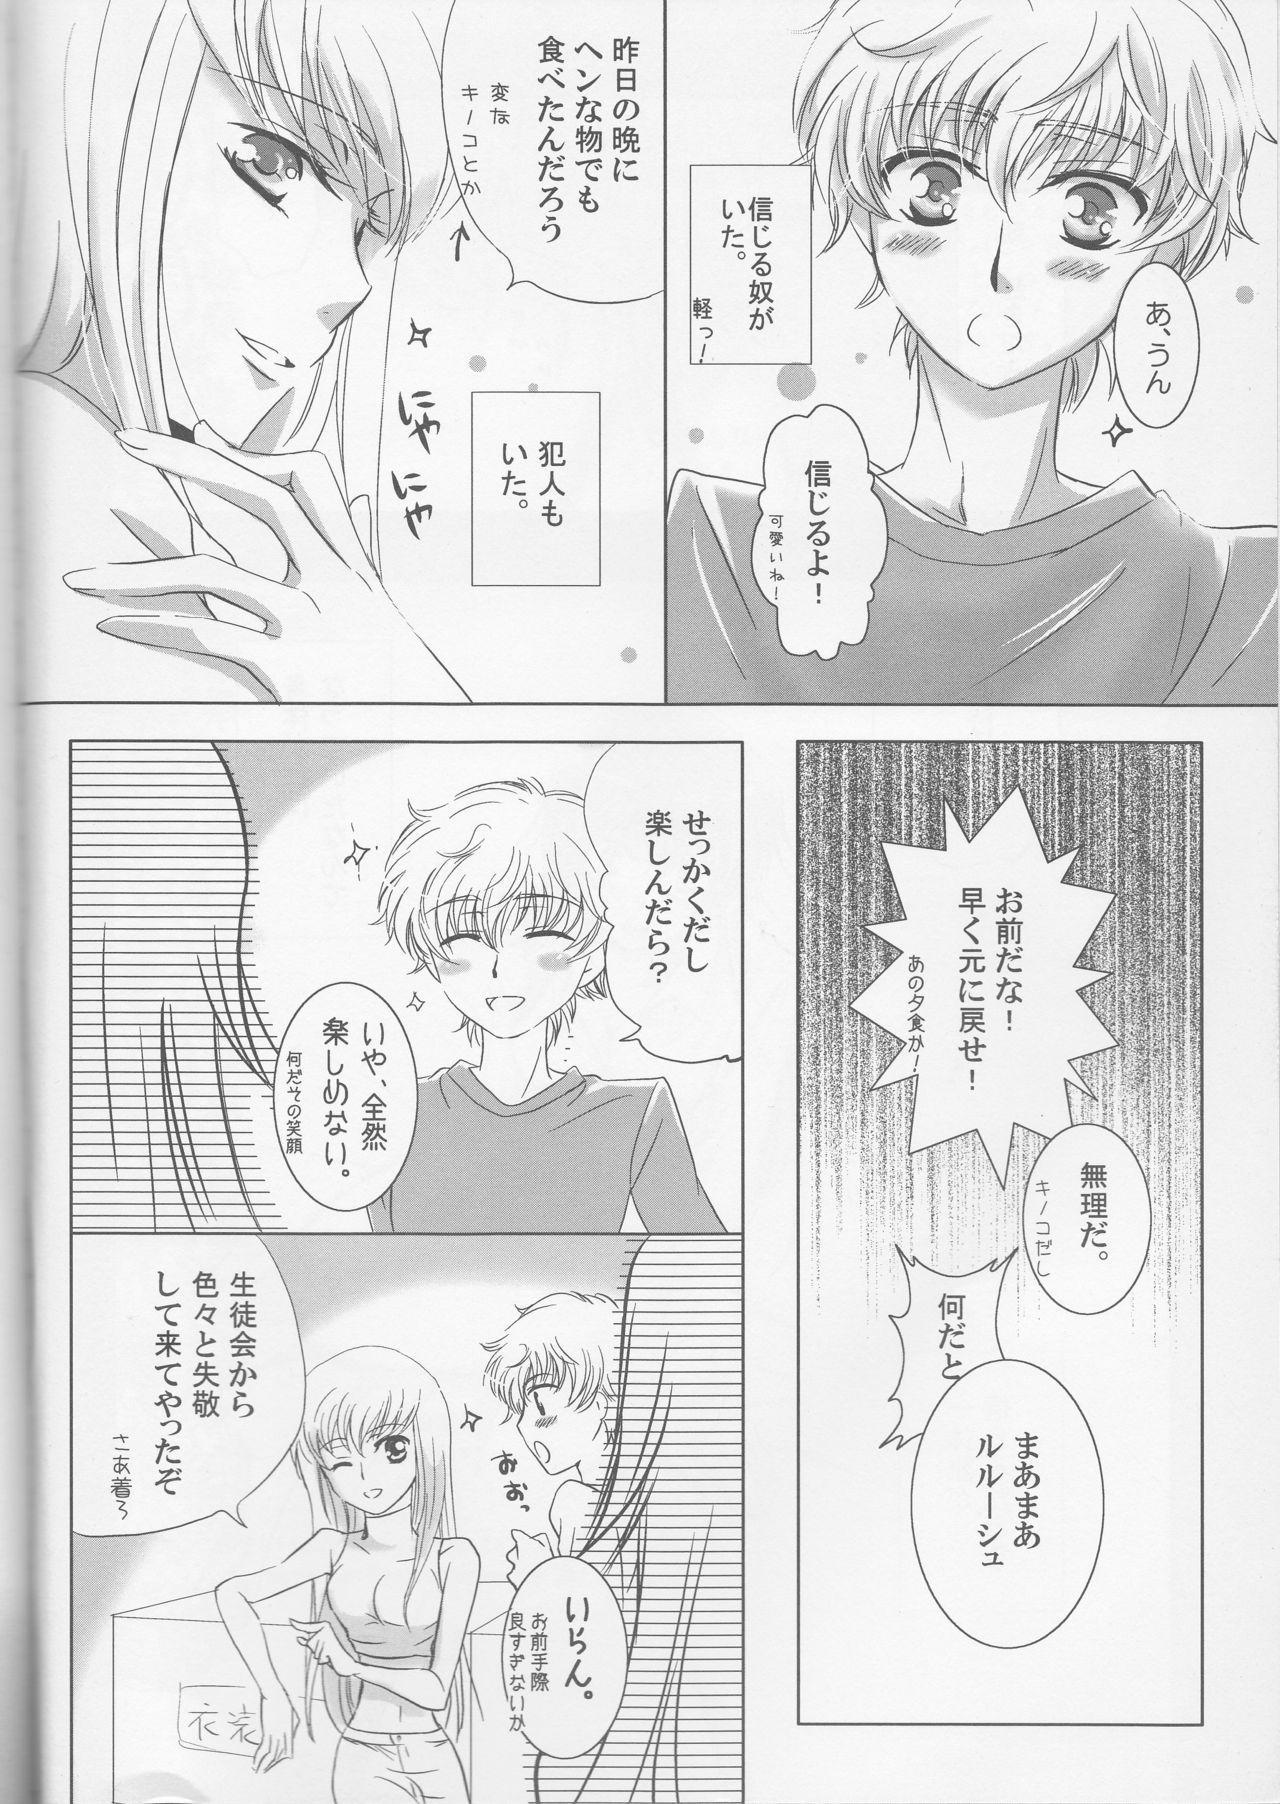 Mitaiken Ryouiki 5